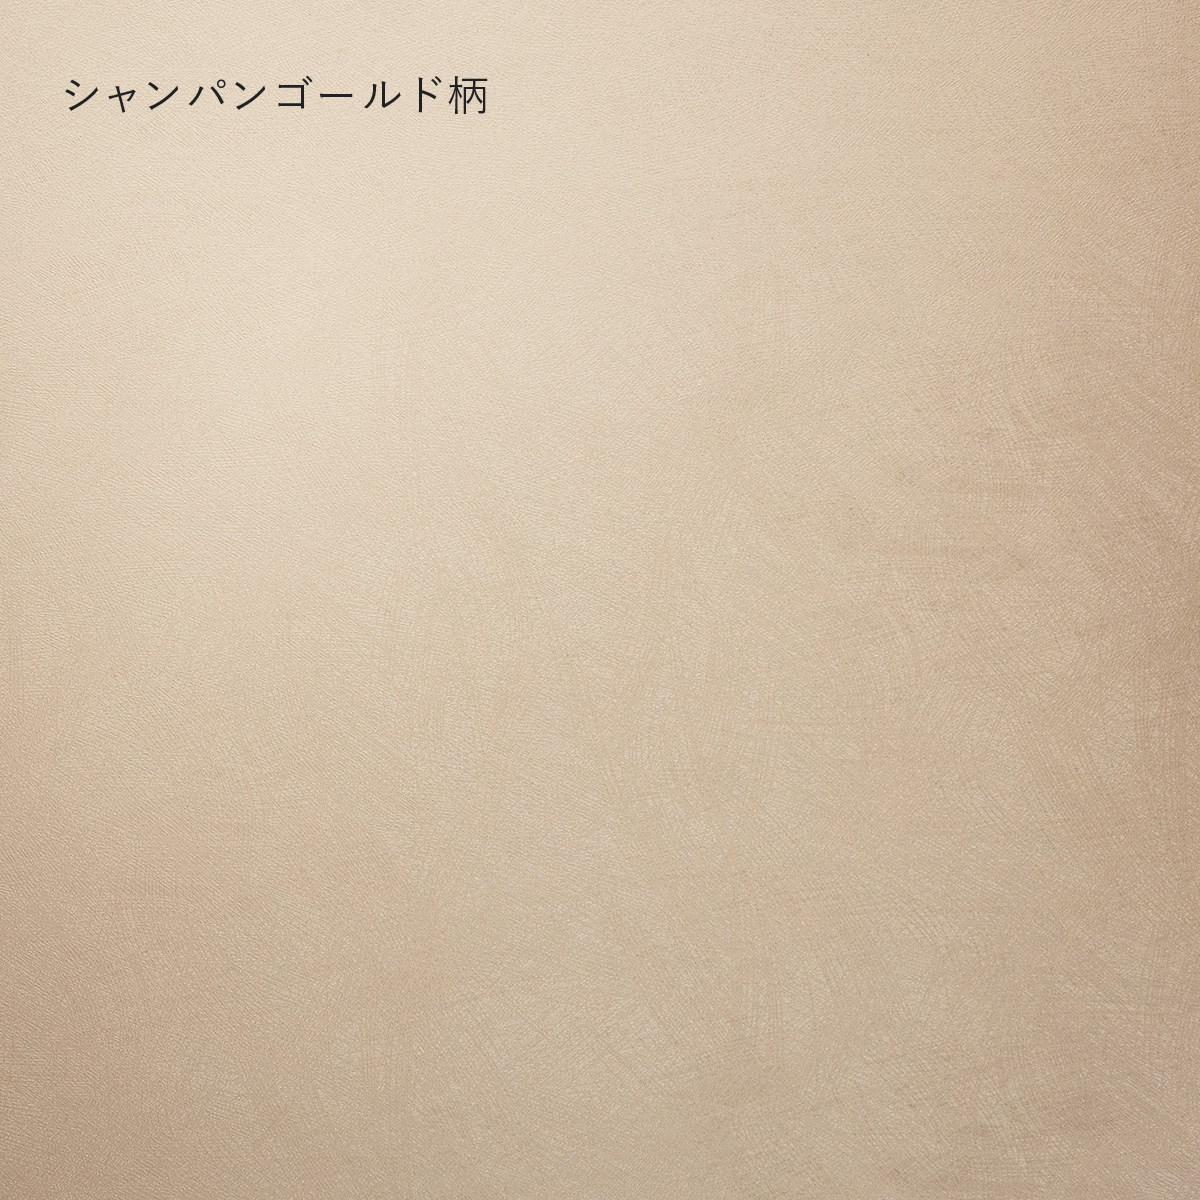 【 V-TISS LIGHT #016 】 優しい印象のローボード